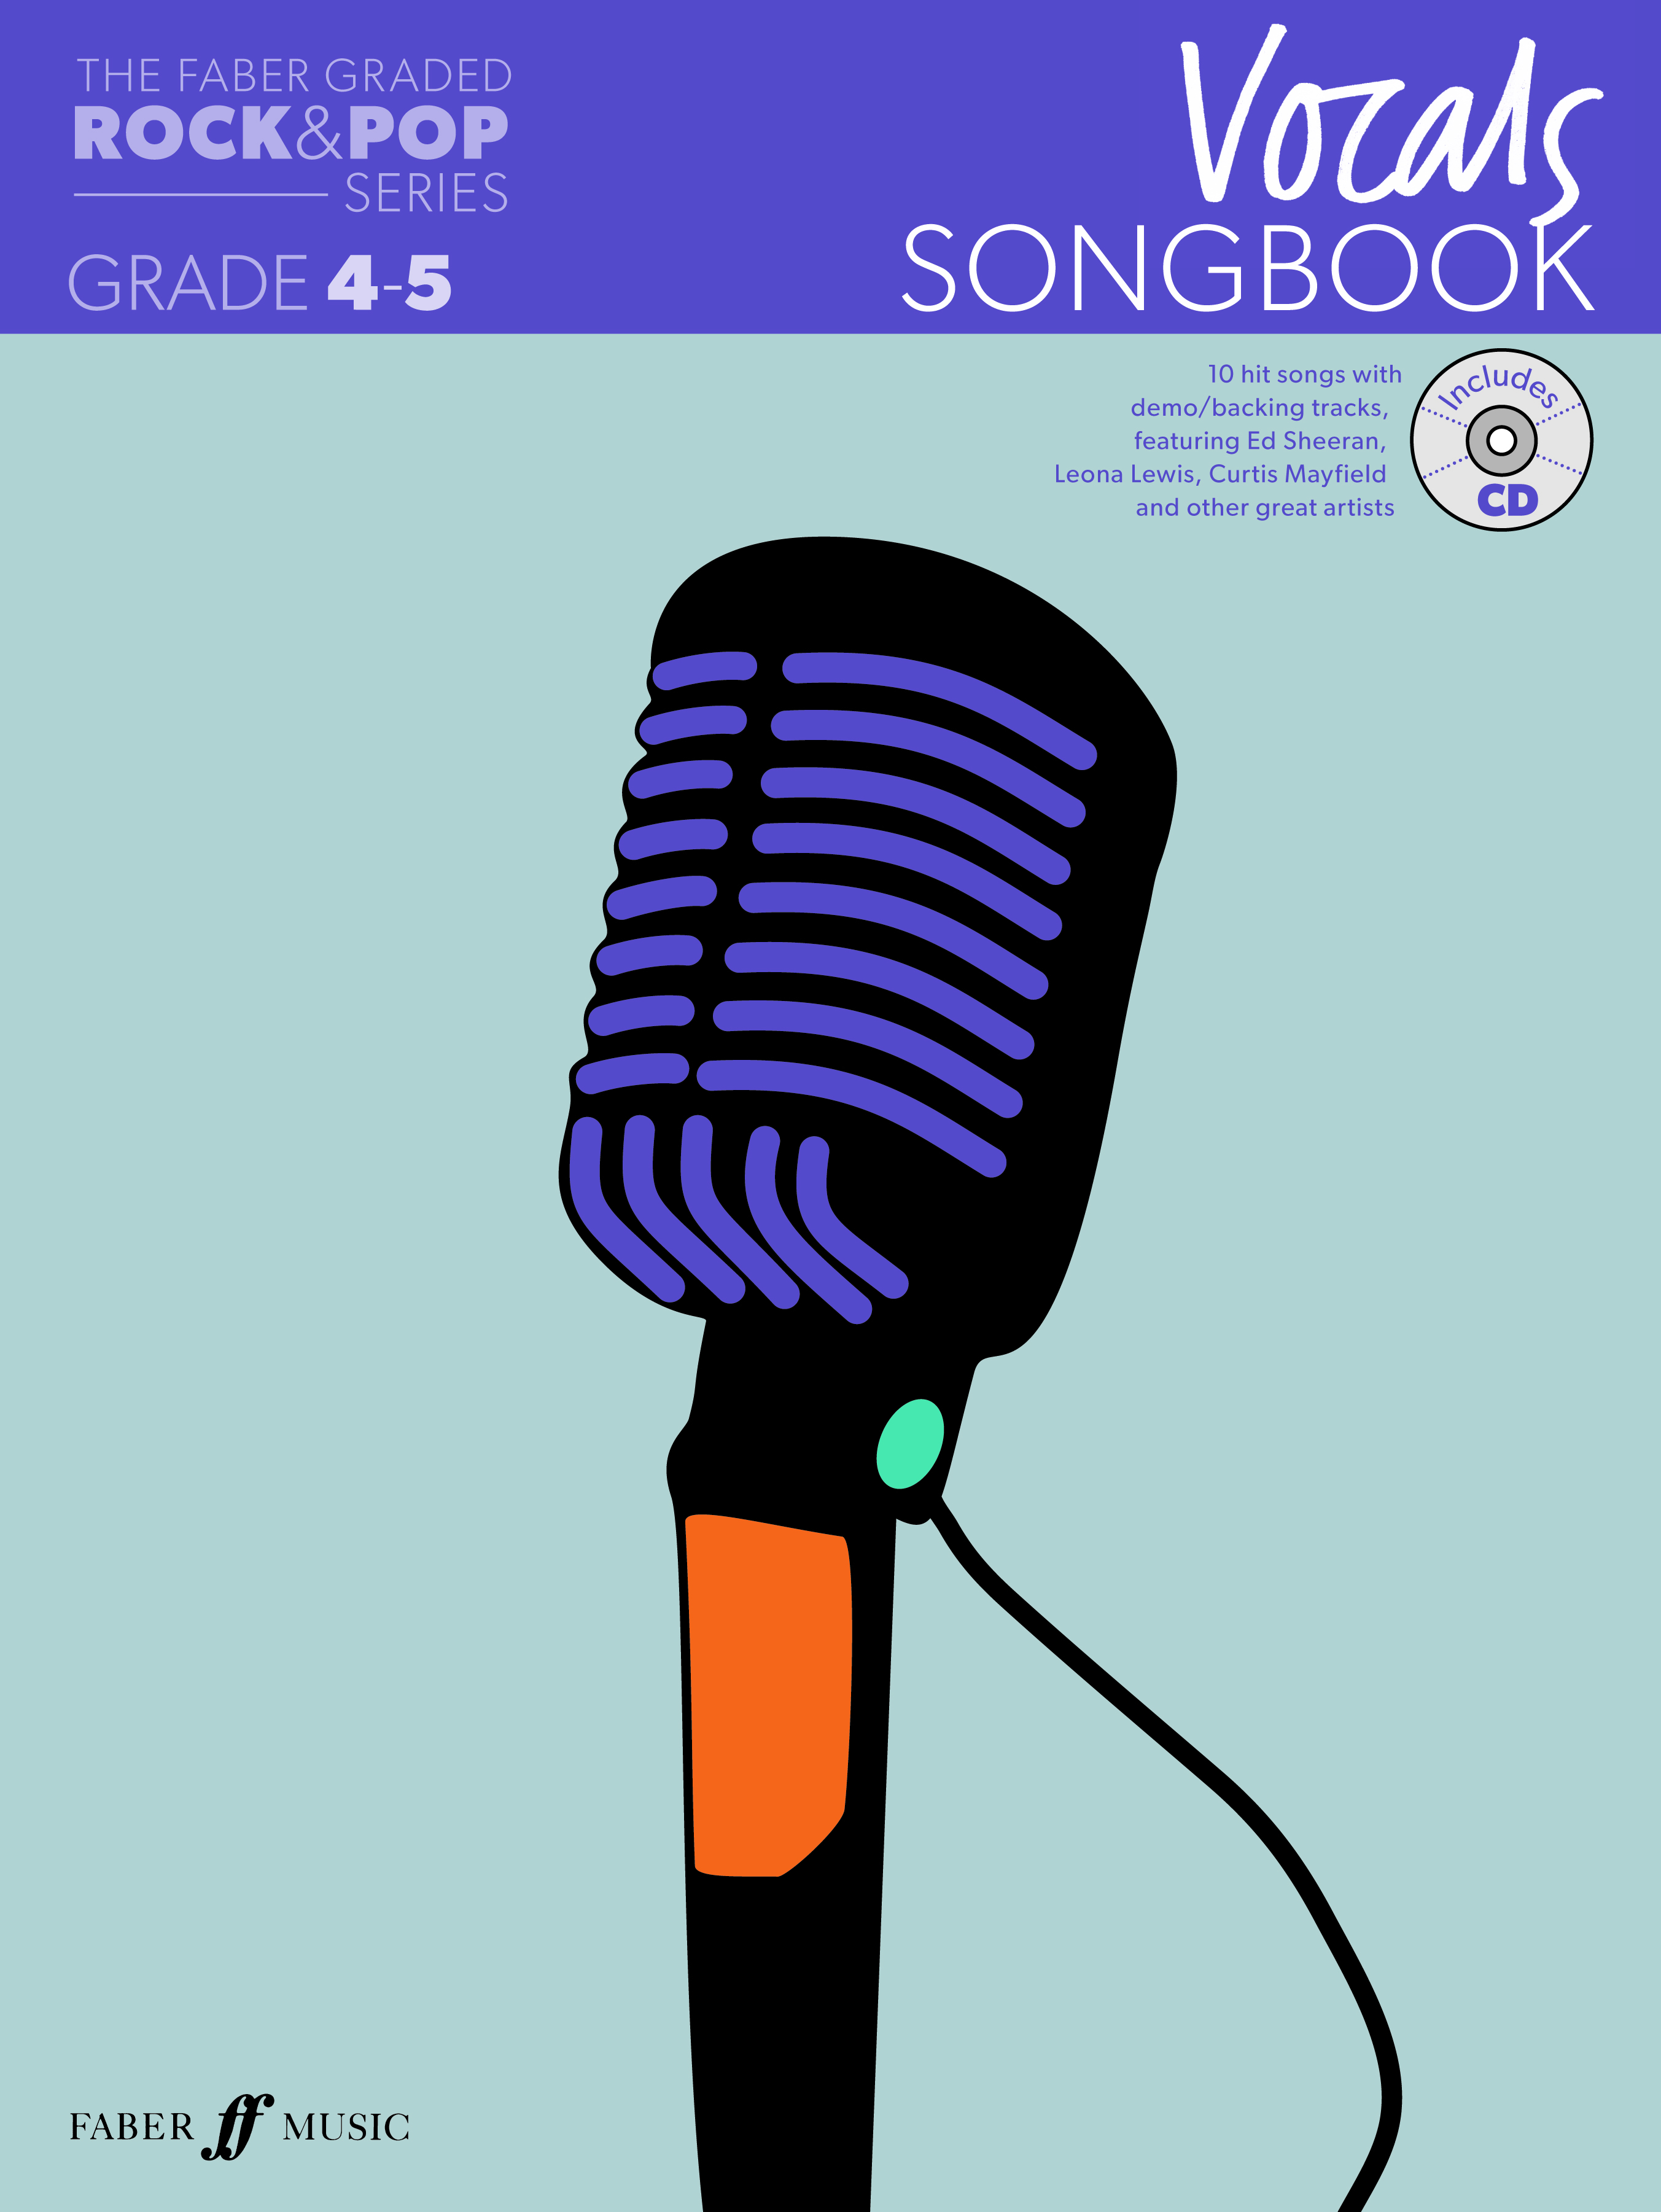 Graded Rock & Pop Vocals Songbook 4-5: Vocal: Vocal Album